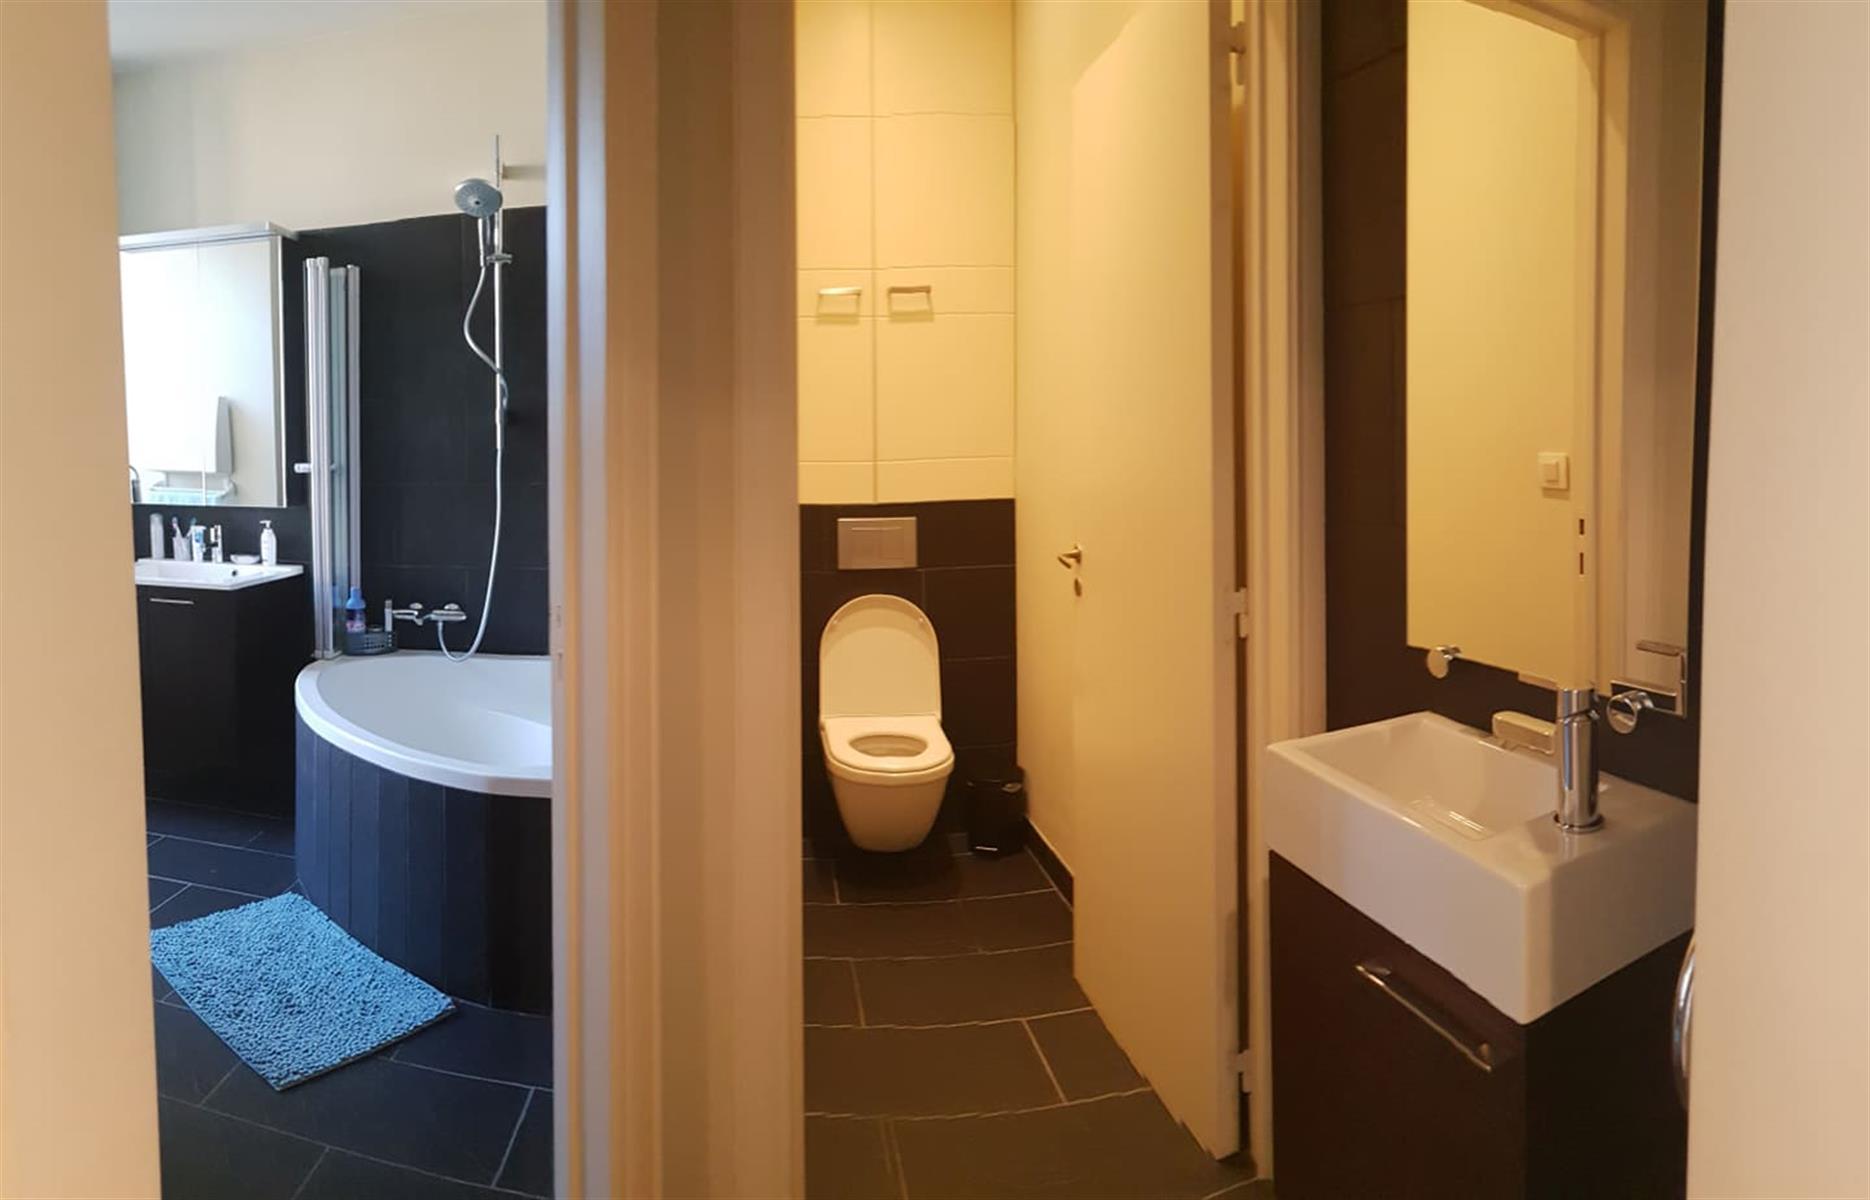 Appartement - Woluwe-Saint-Lambert - #4162898-10